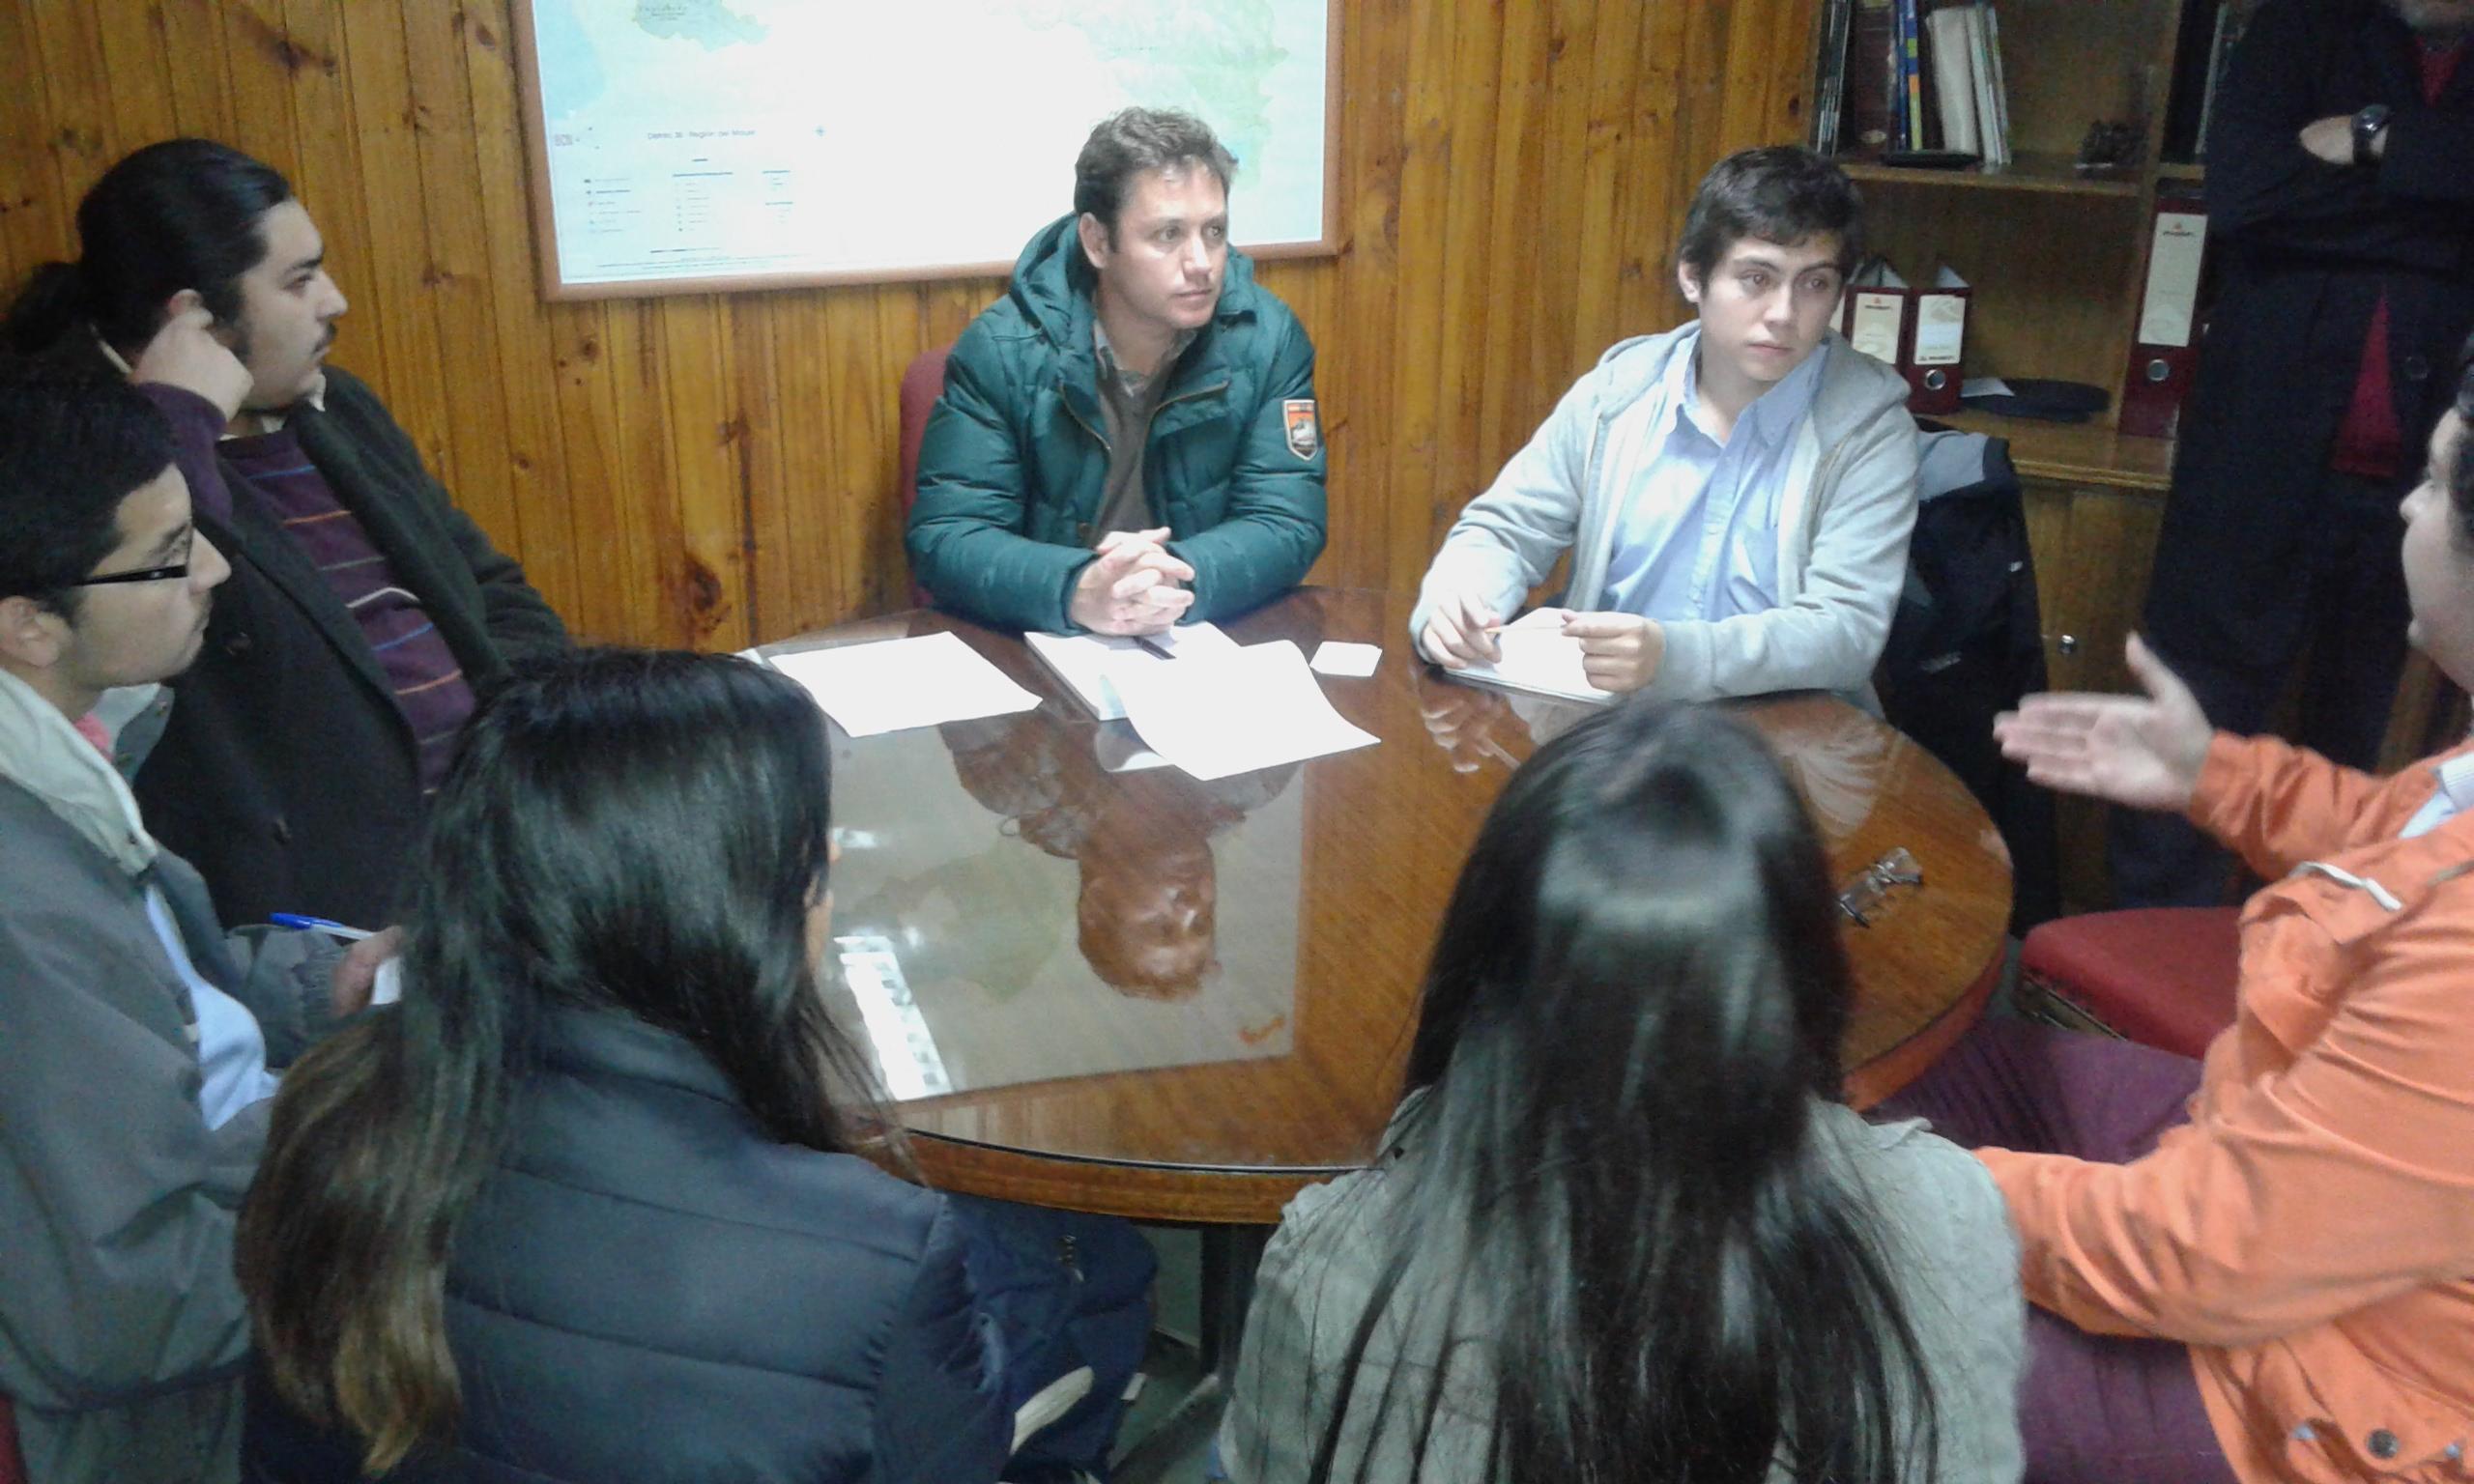 Diputado Pedro Pablo Álvarez-Salamanca se reúne con estudiantes universitarios de la región